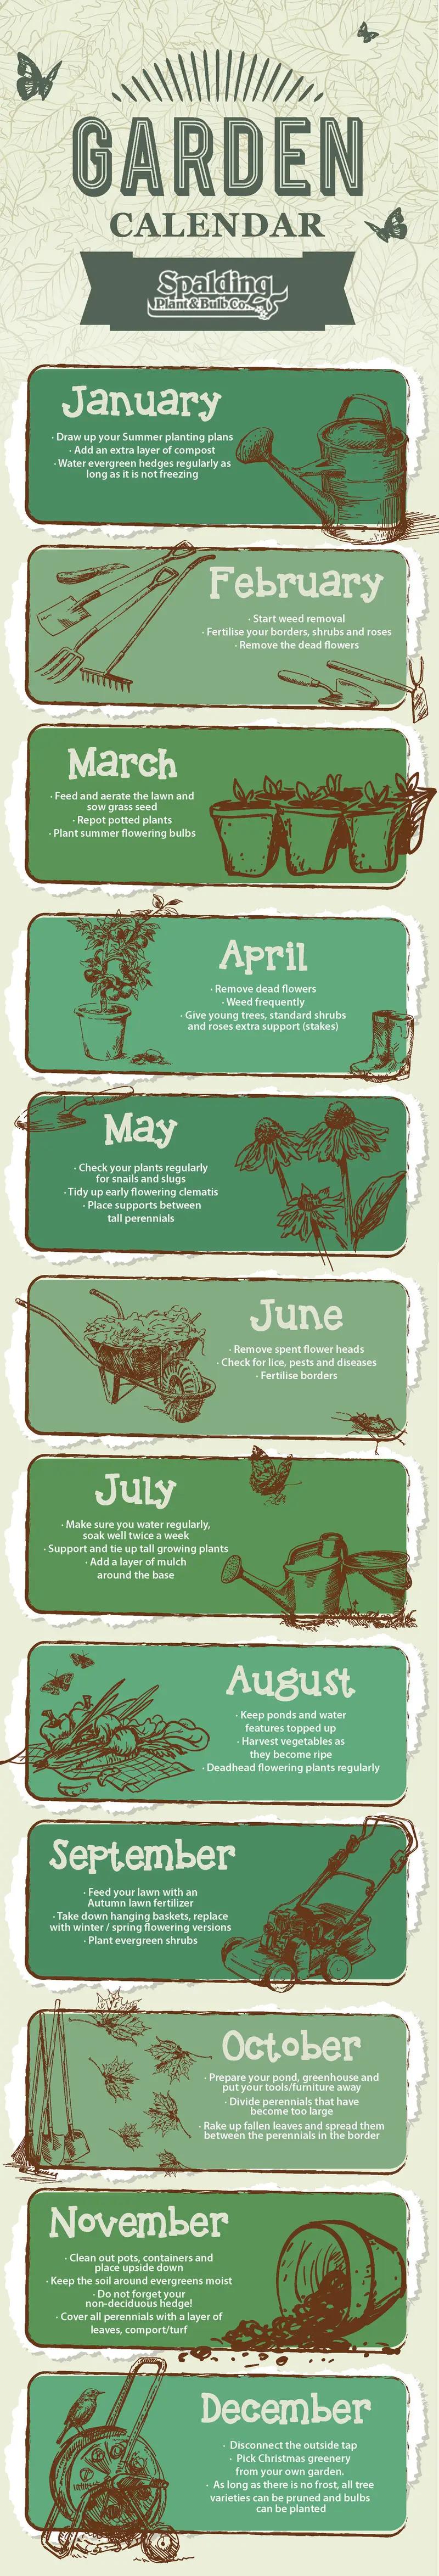 23 Diagrams That Make Gardening So Much Easier January February